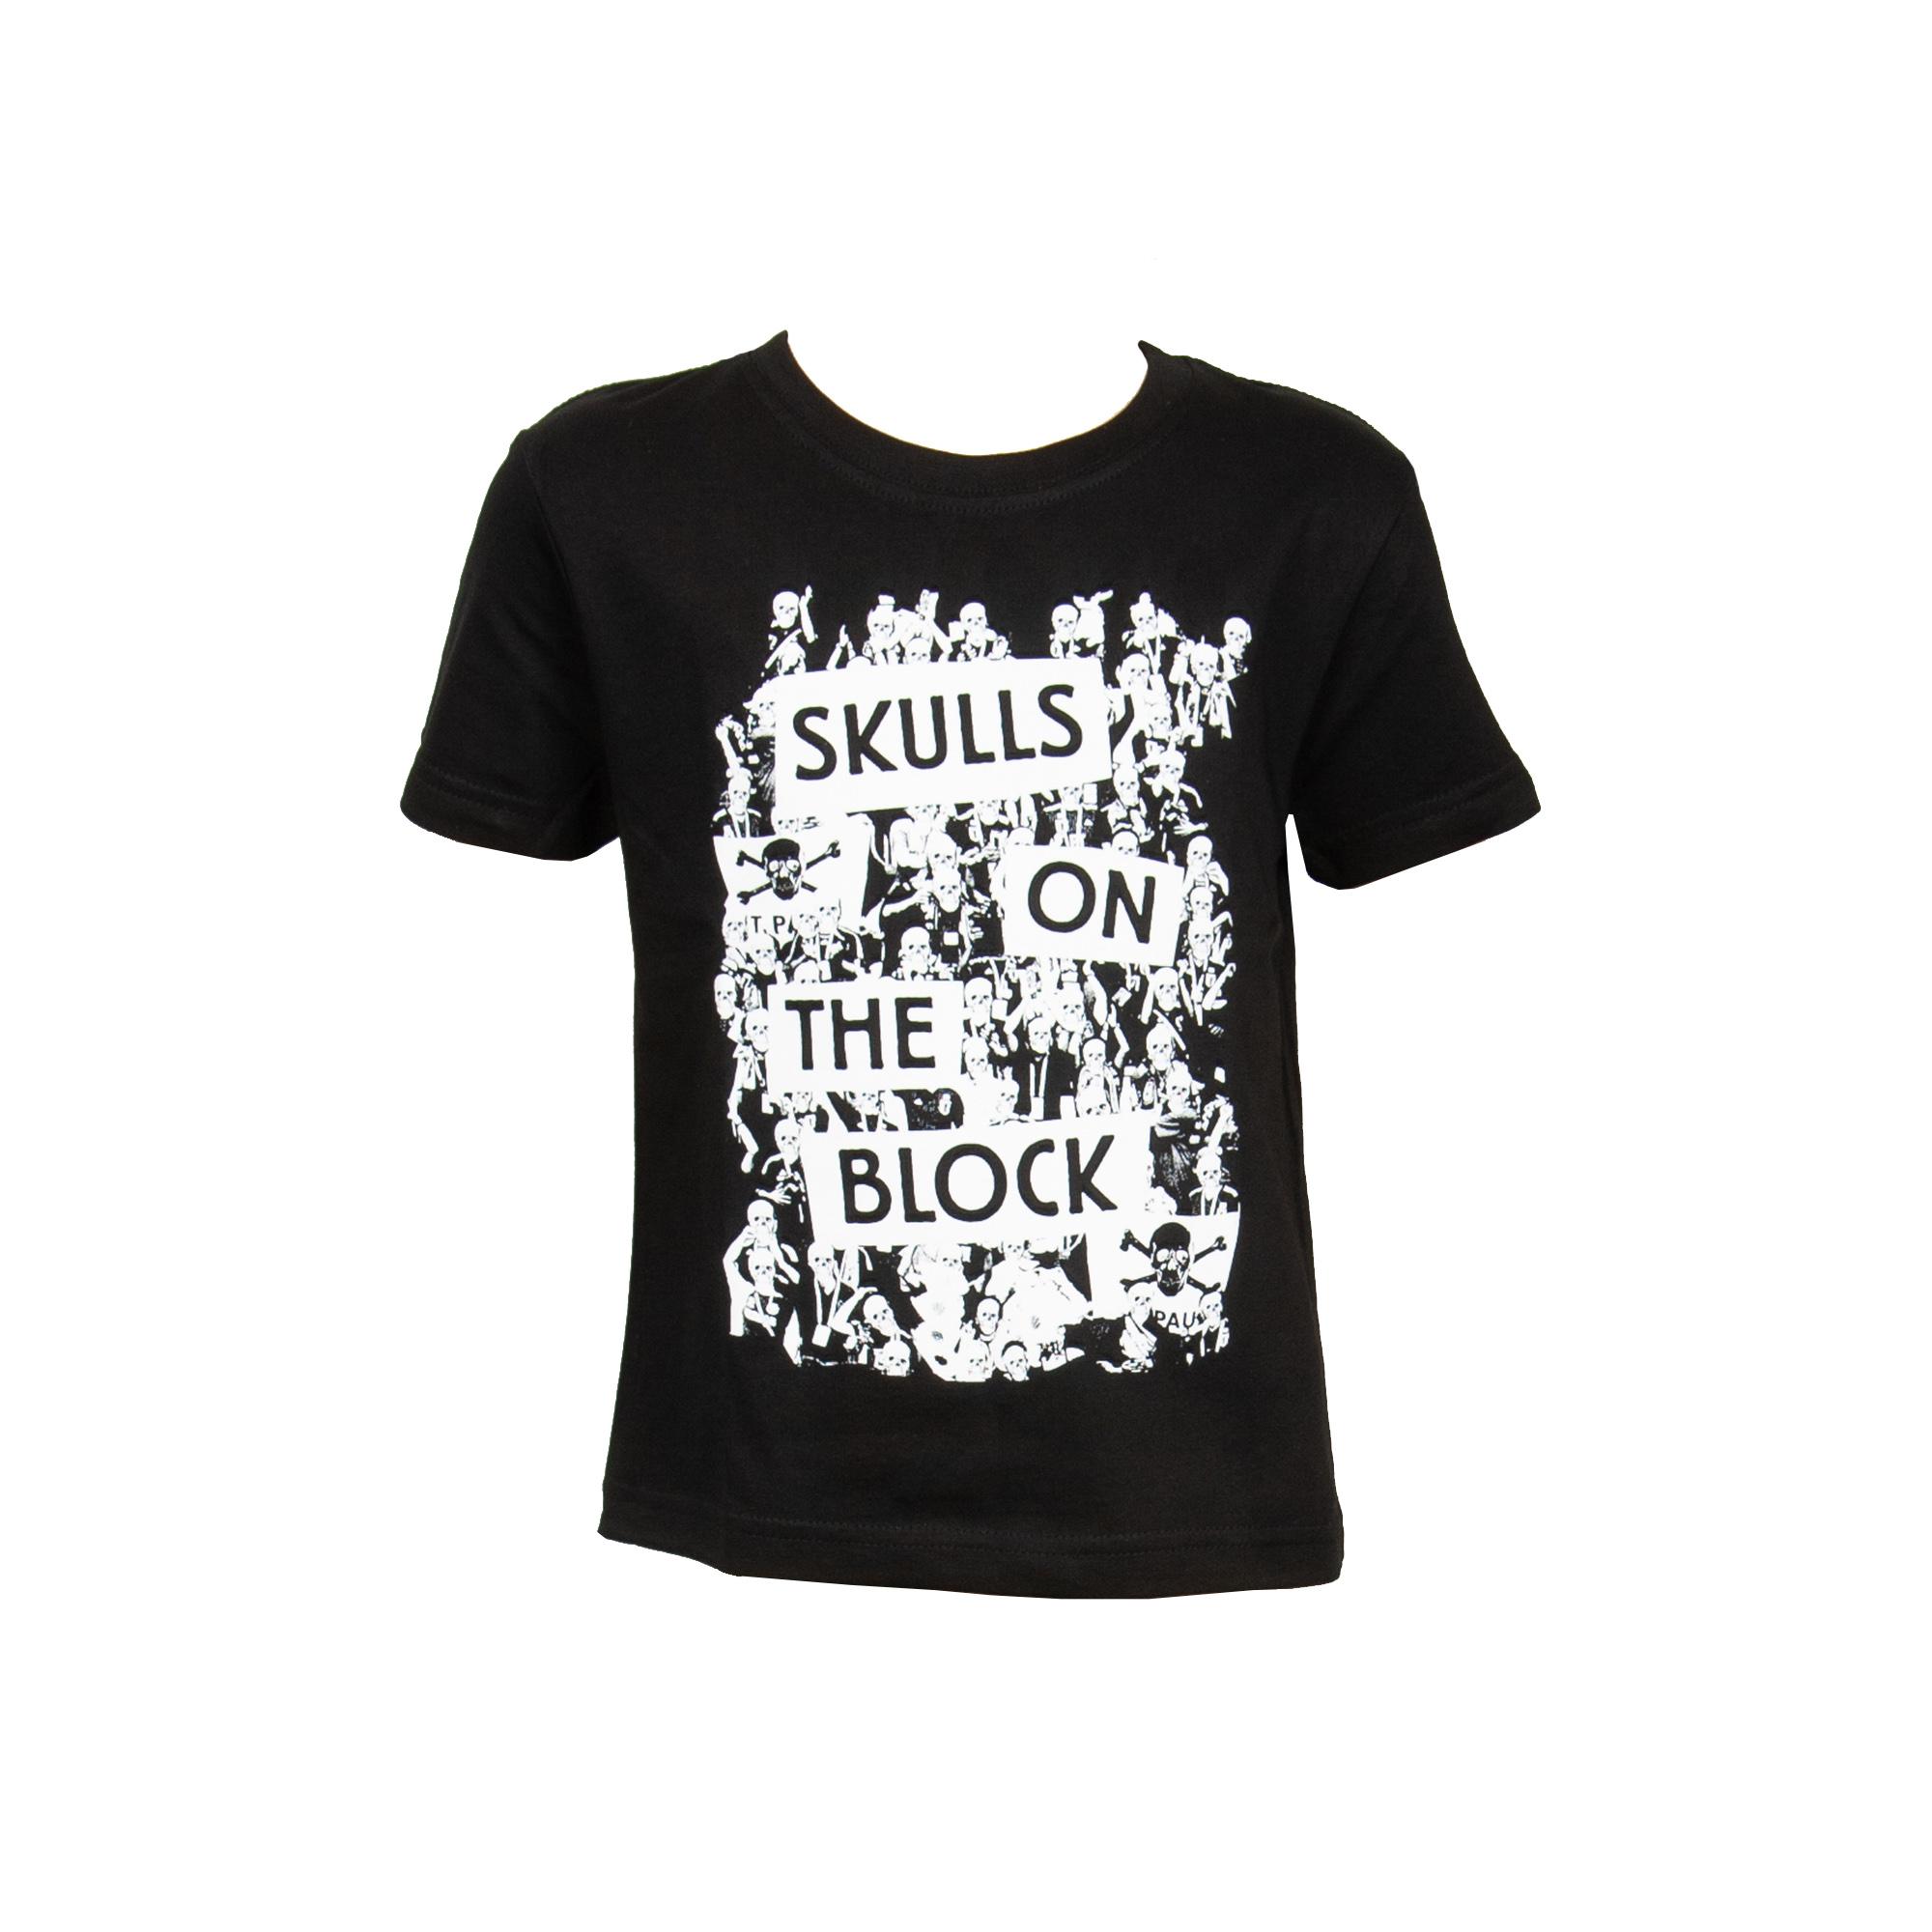 FC St. Pauli - Kinder T-Shirt Skulls - schwarz